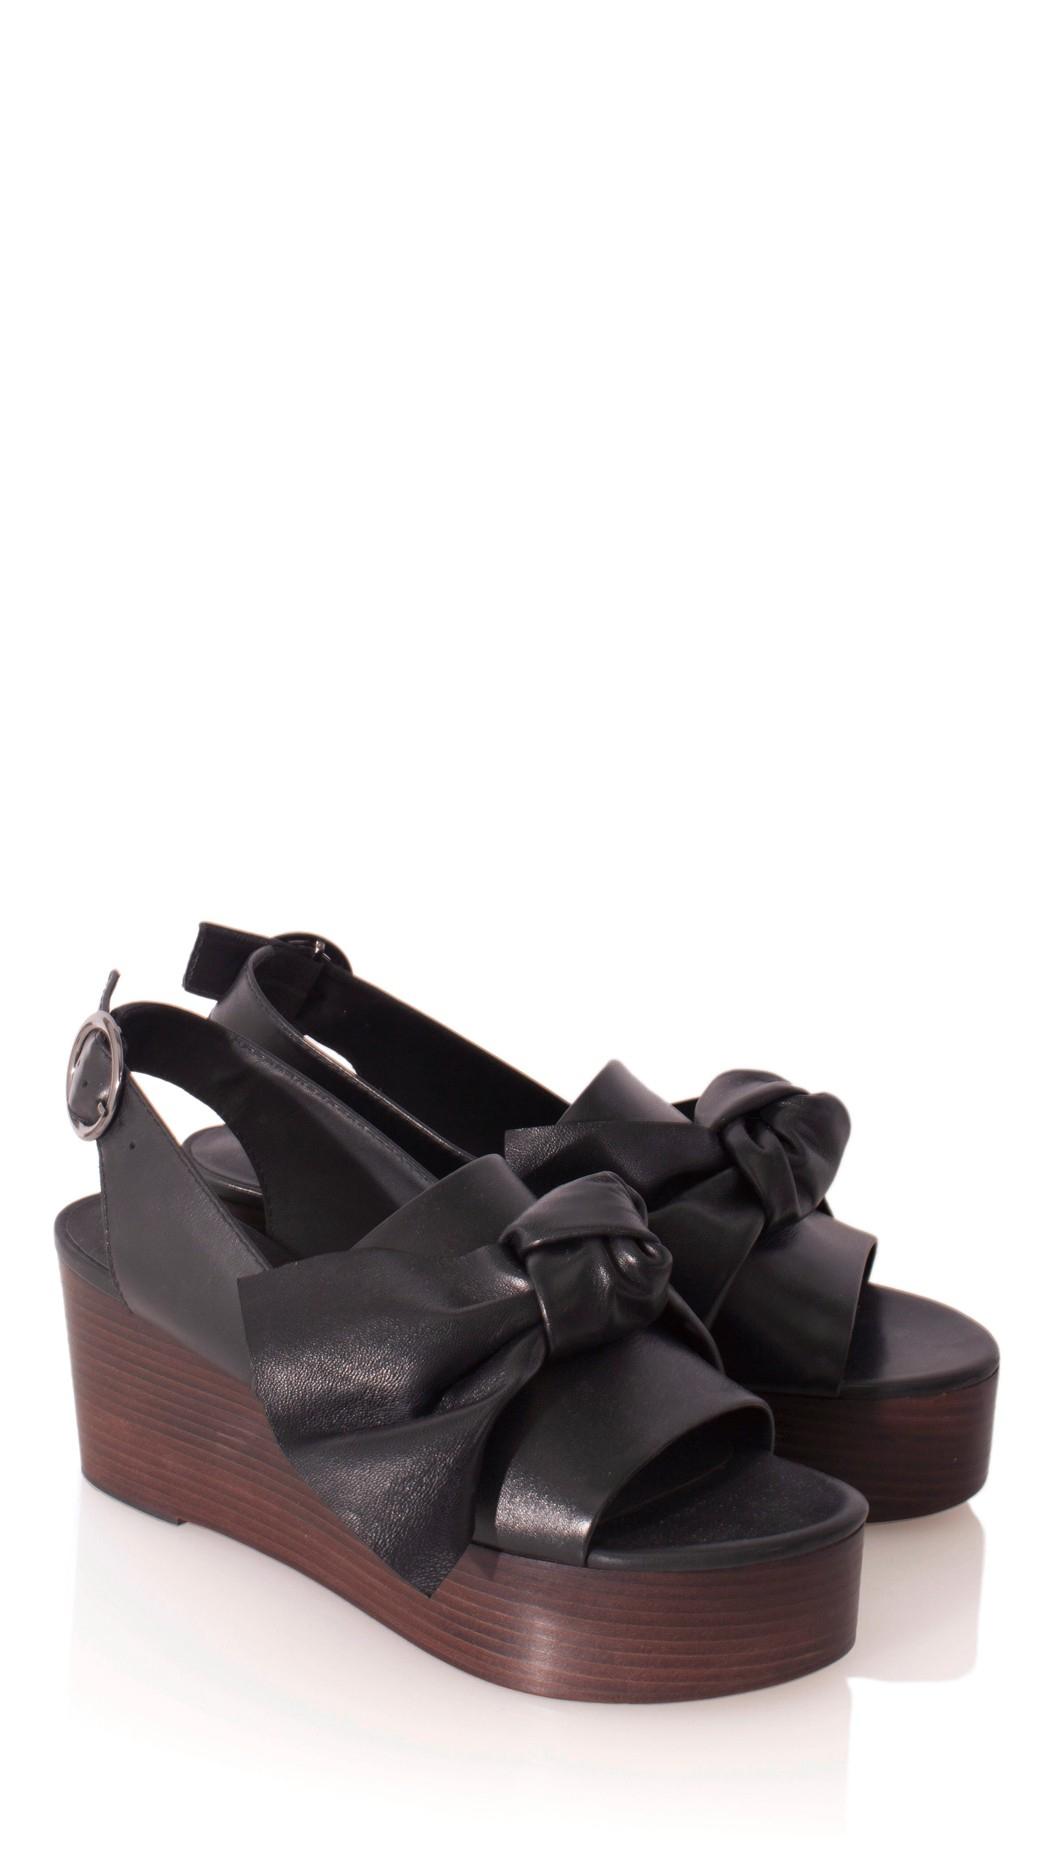 28be0951d1f8 Lyst - Tibi Estel Platform Sandals in Black